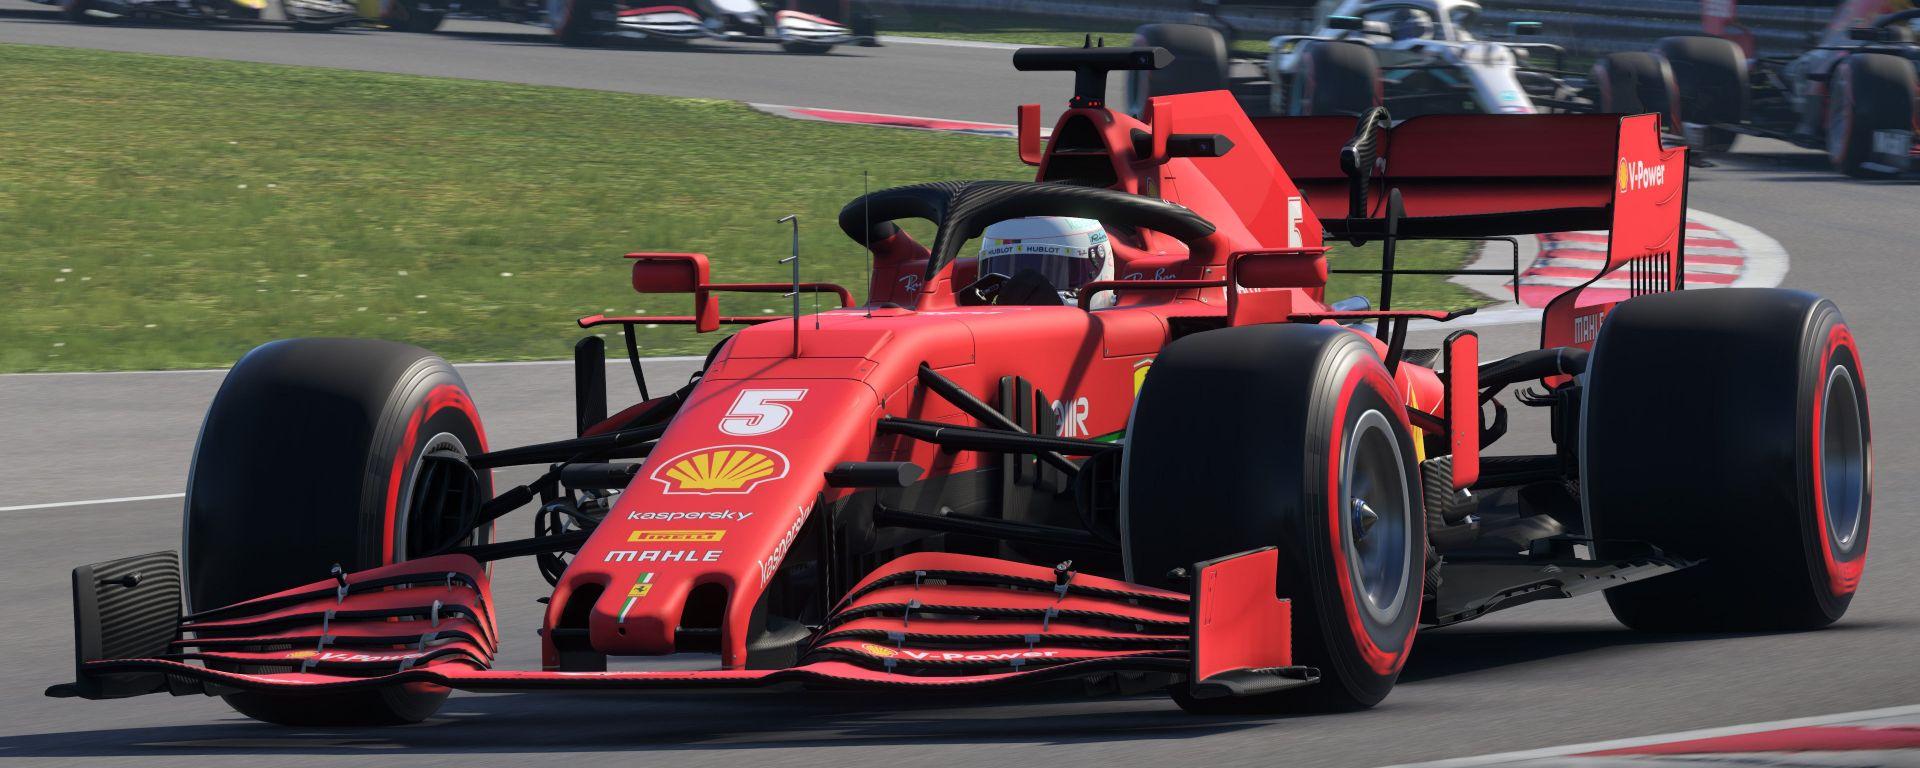 F1 2020: la Ferrari di Vettel